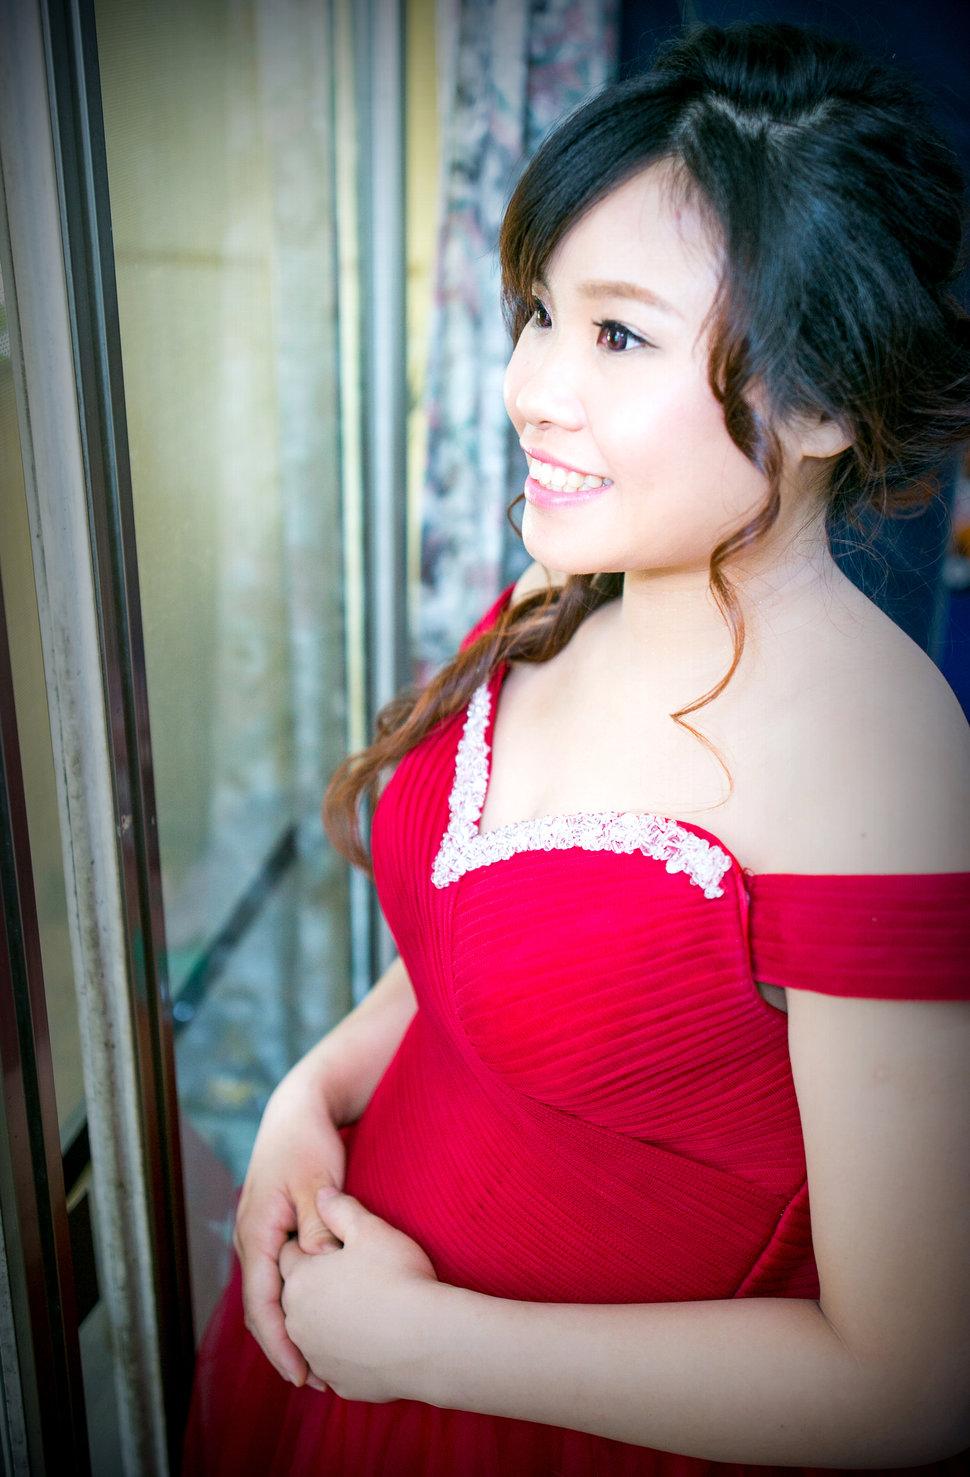 YF2A0720 - Yusin 攝影~與您同心祝福您永結同心 - 結婚吧